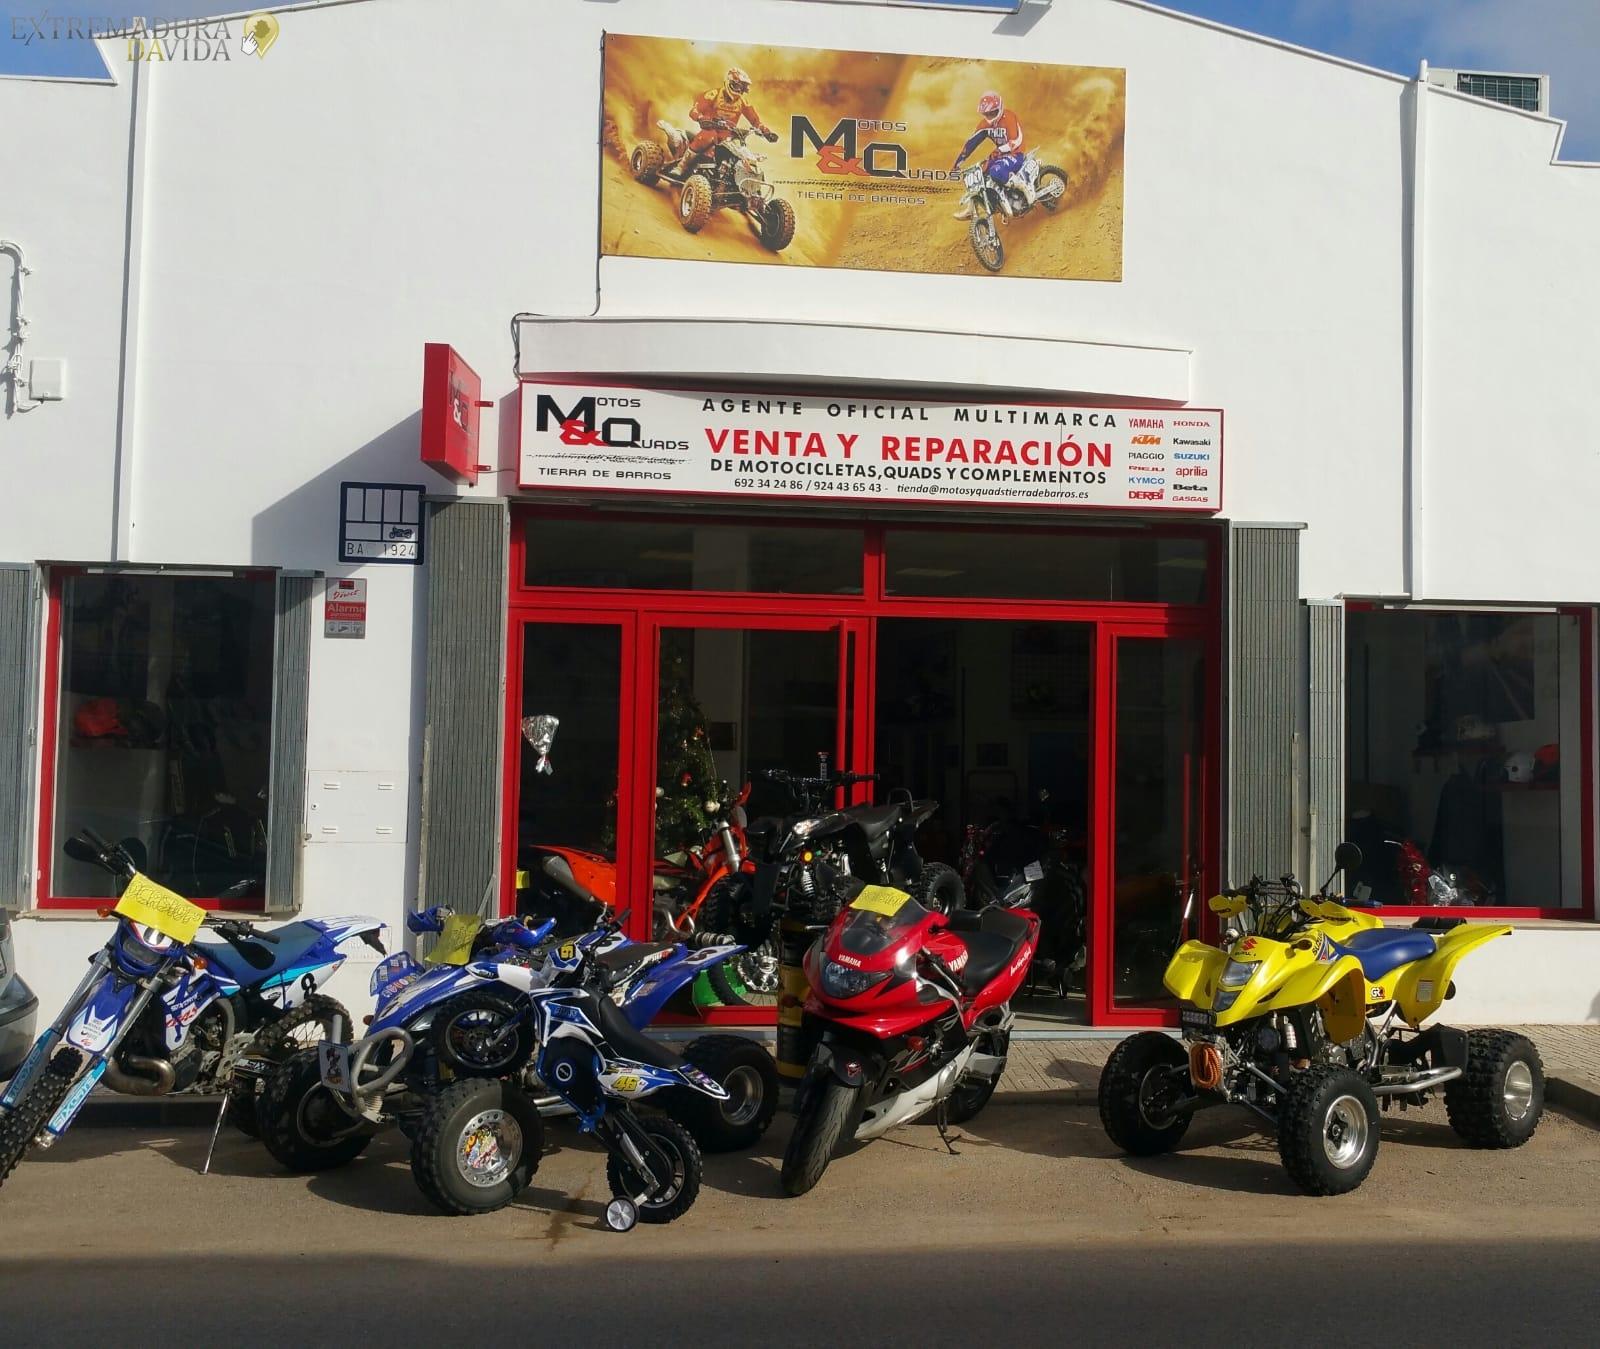 Taller de motos en Almendralejo Quads Mq